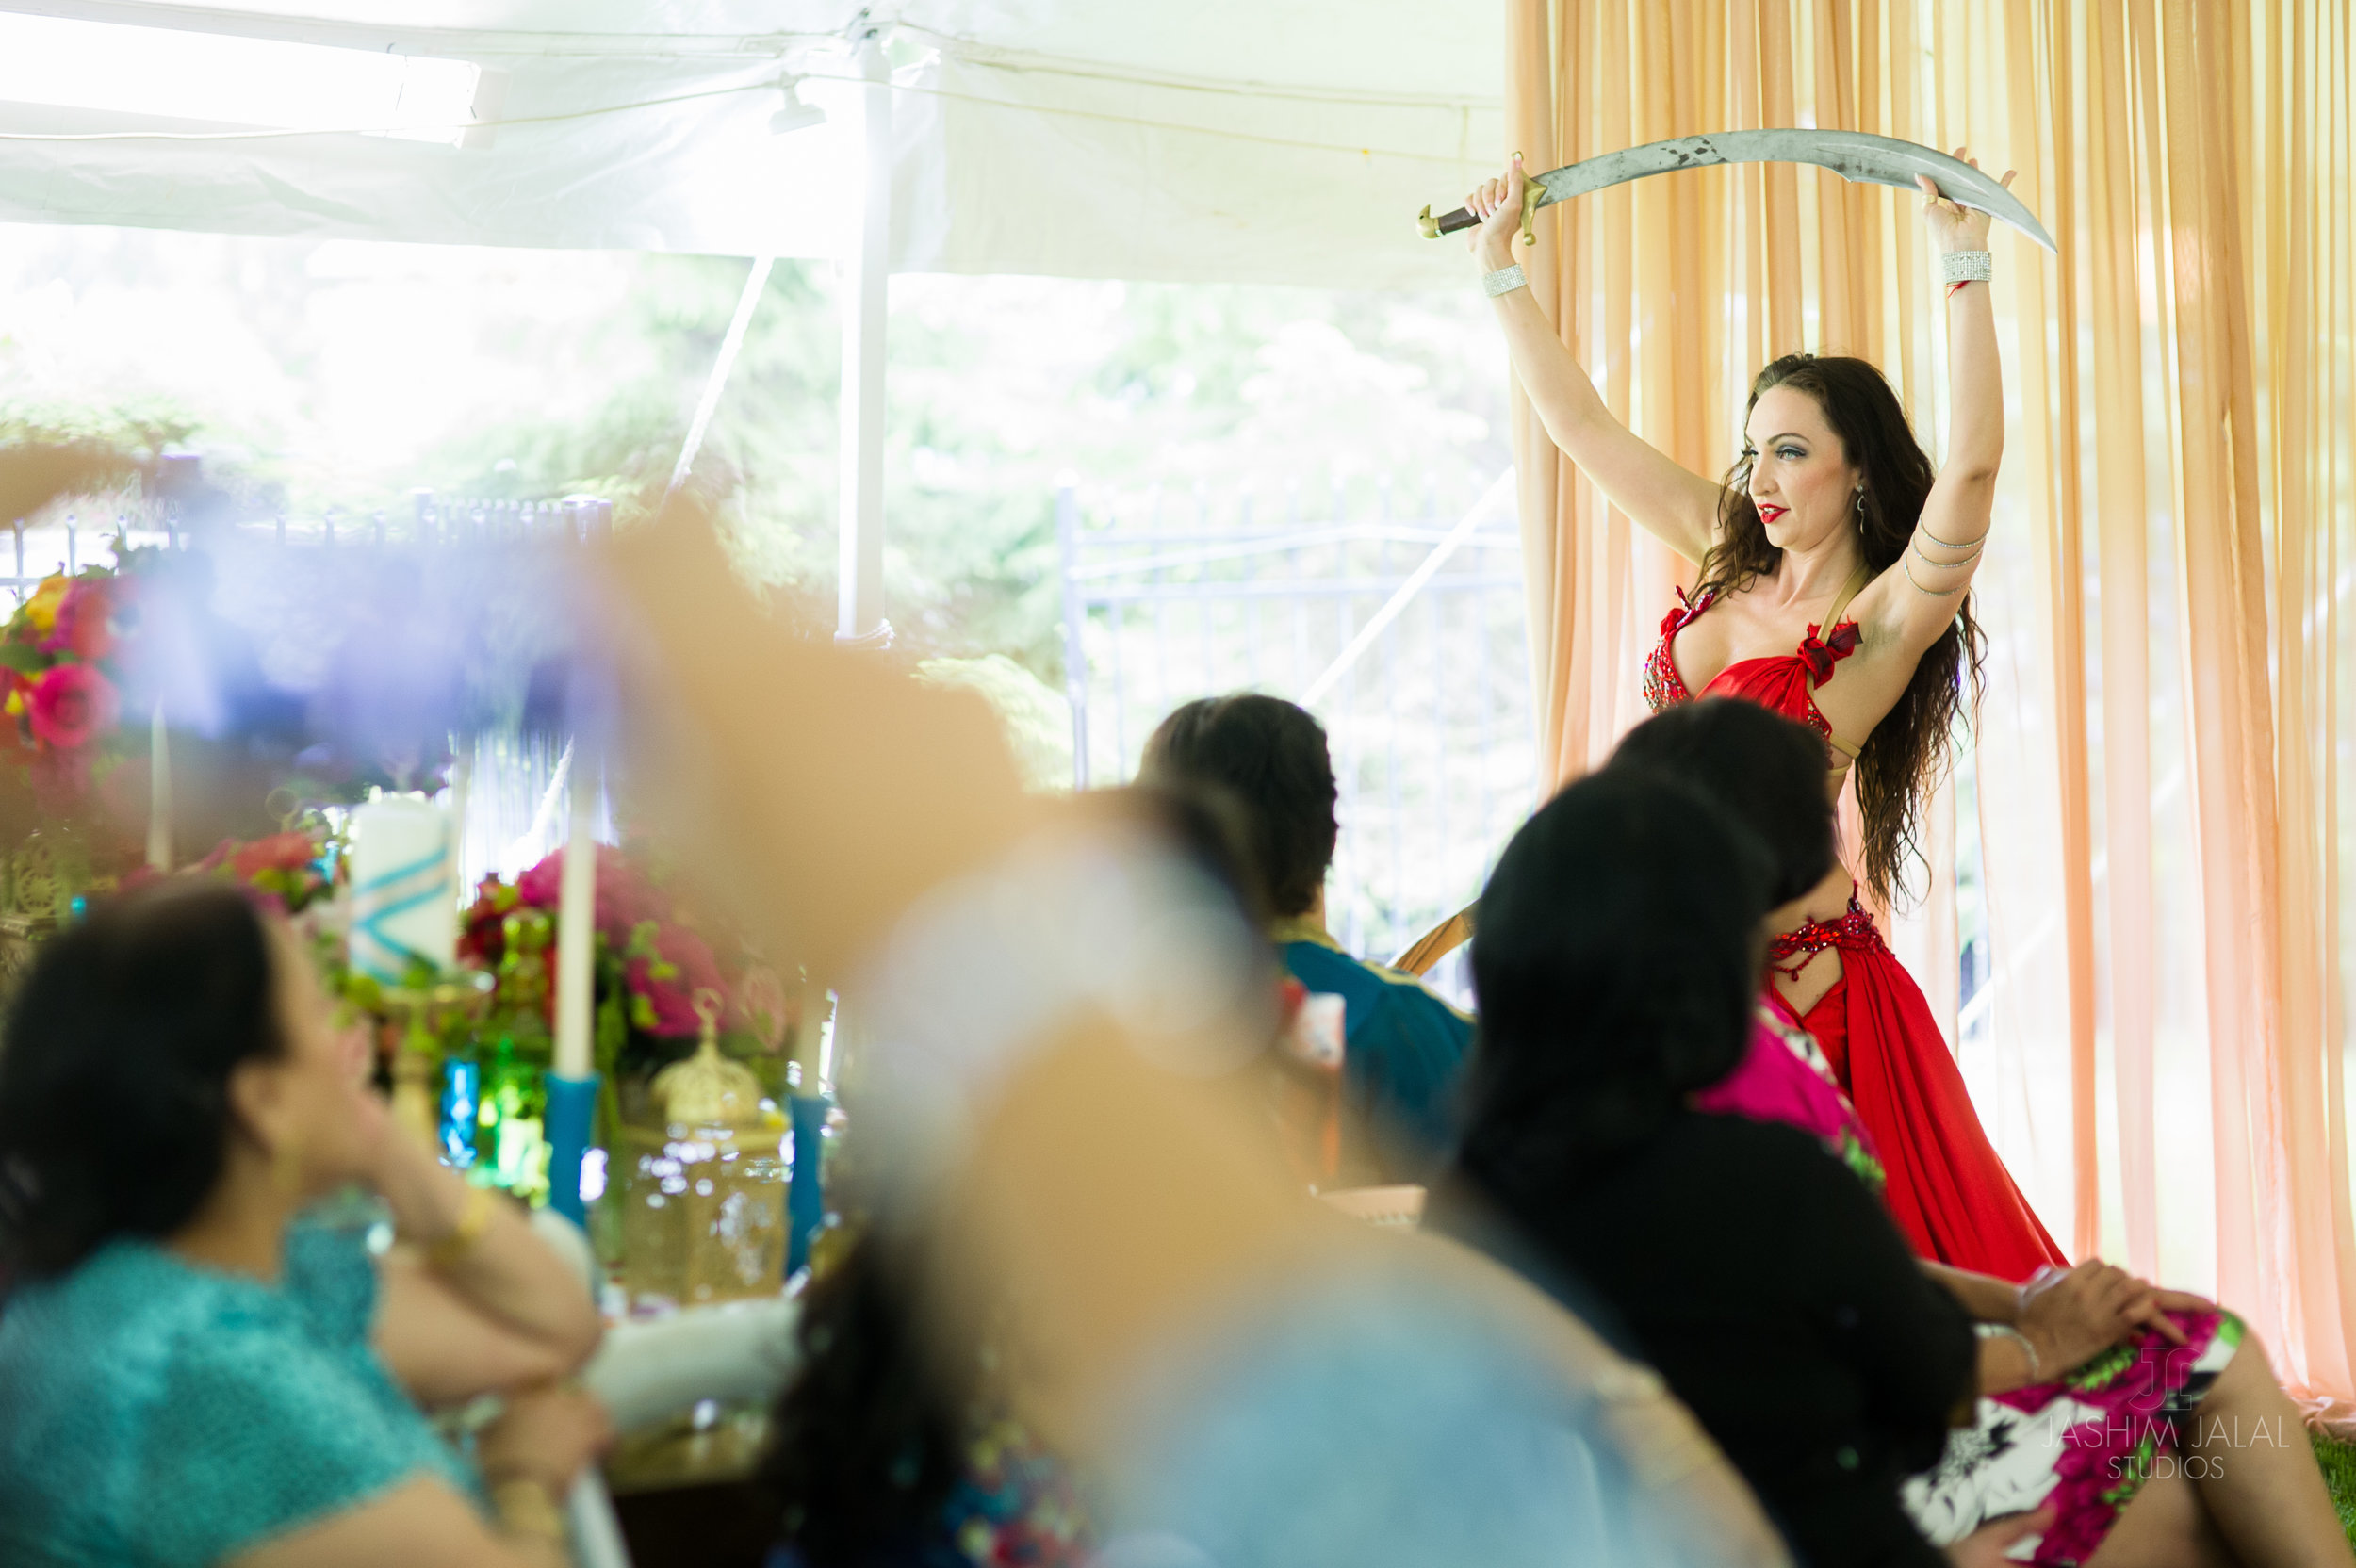 Indian Bridal Shower Boho Chic Summer Tent Event with Dancer (6).JPG